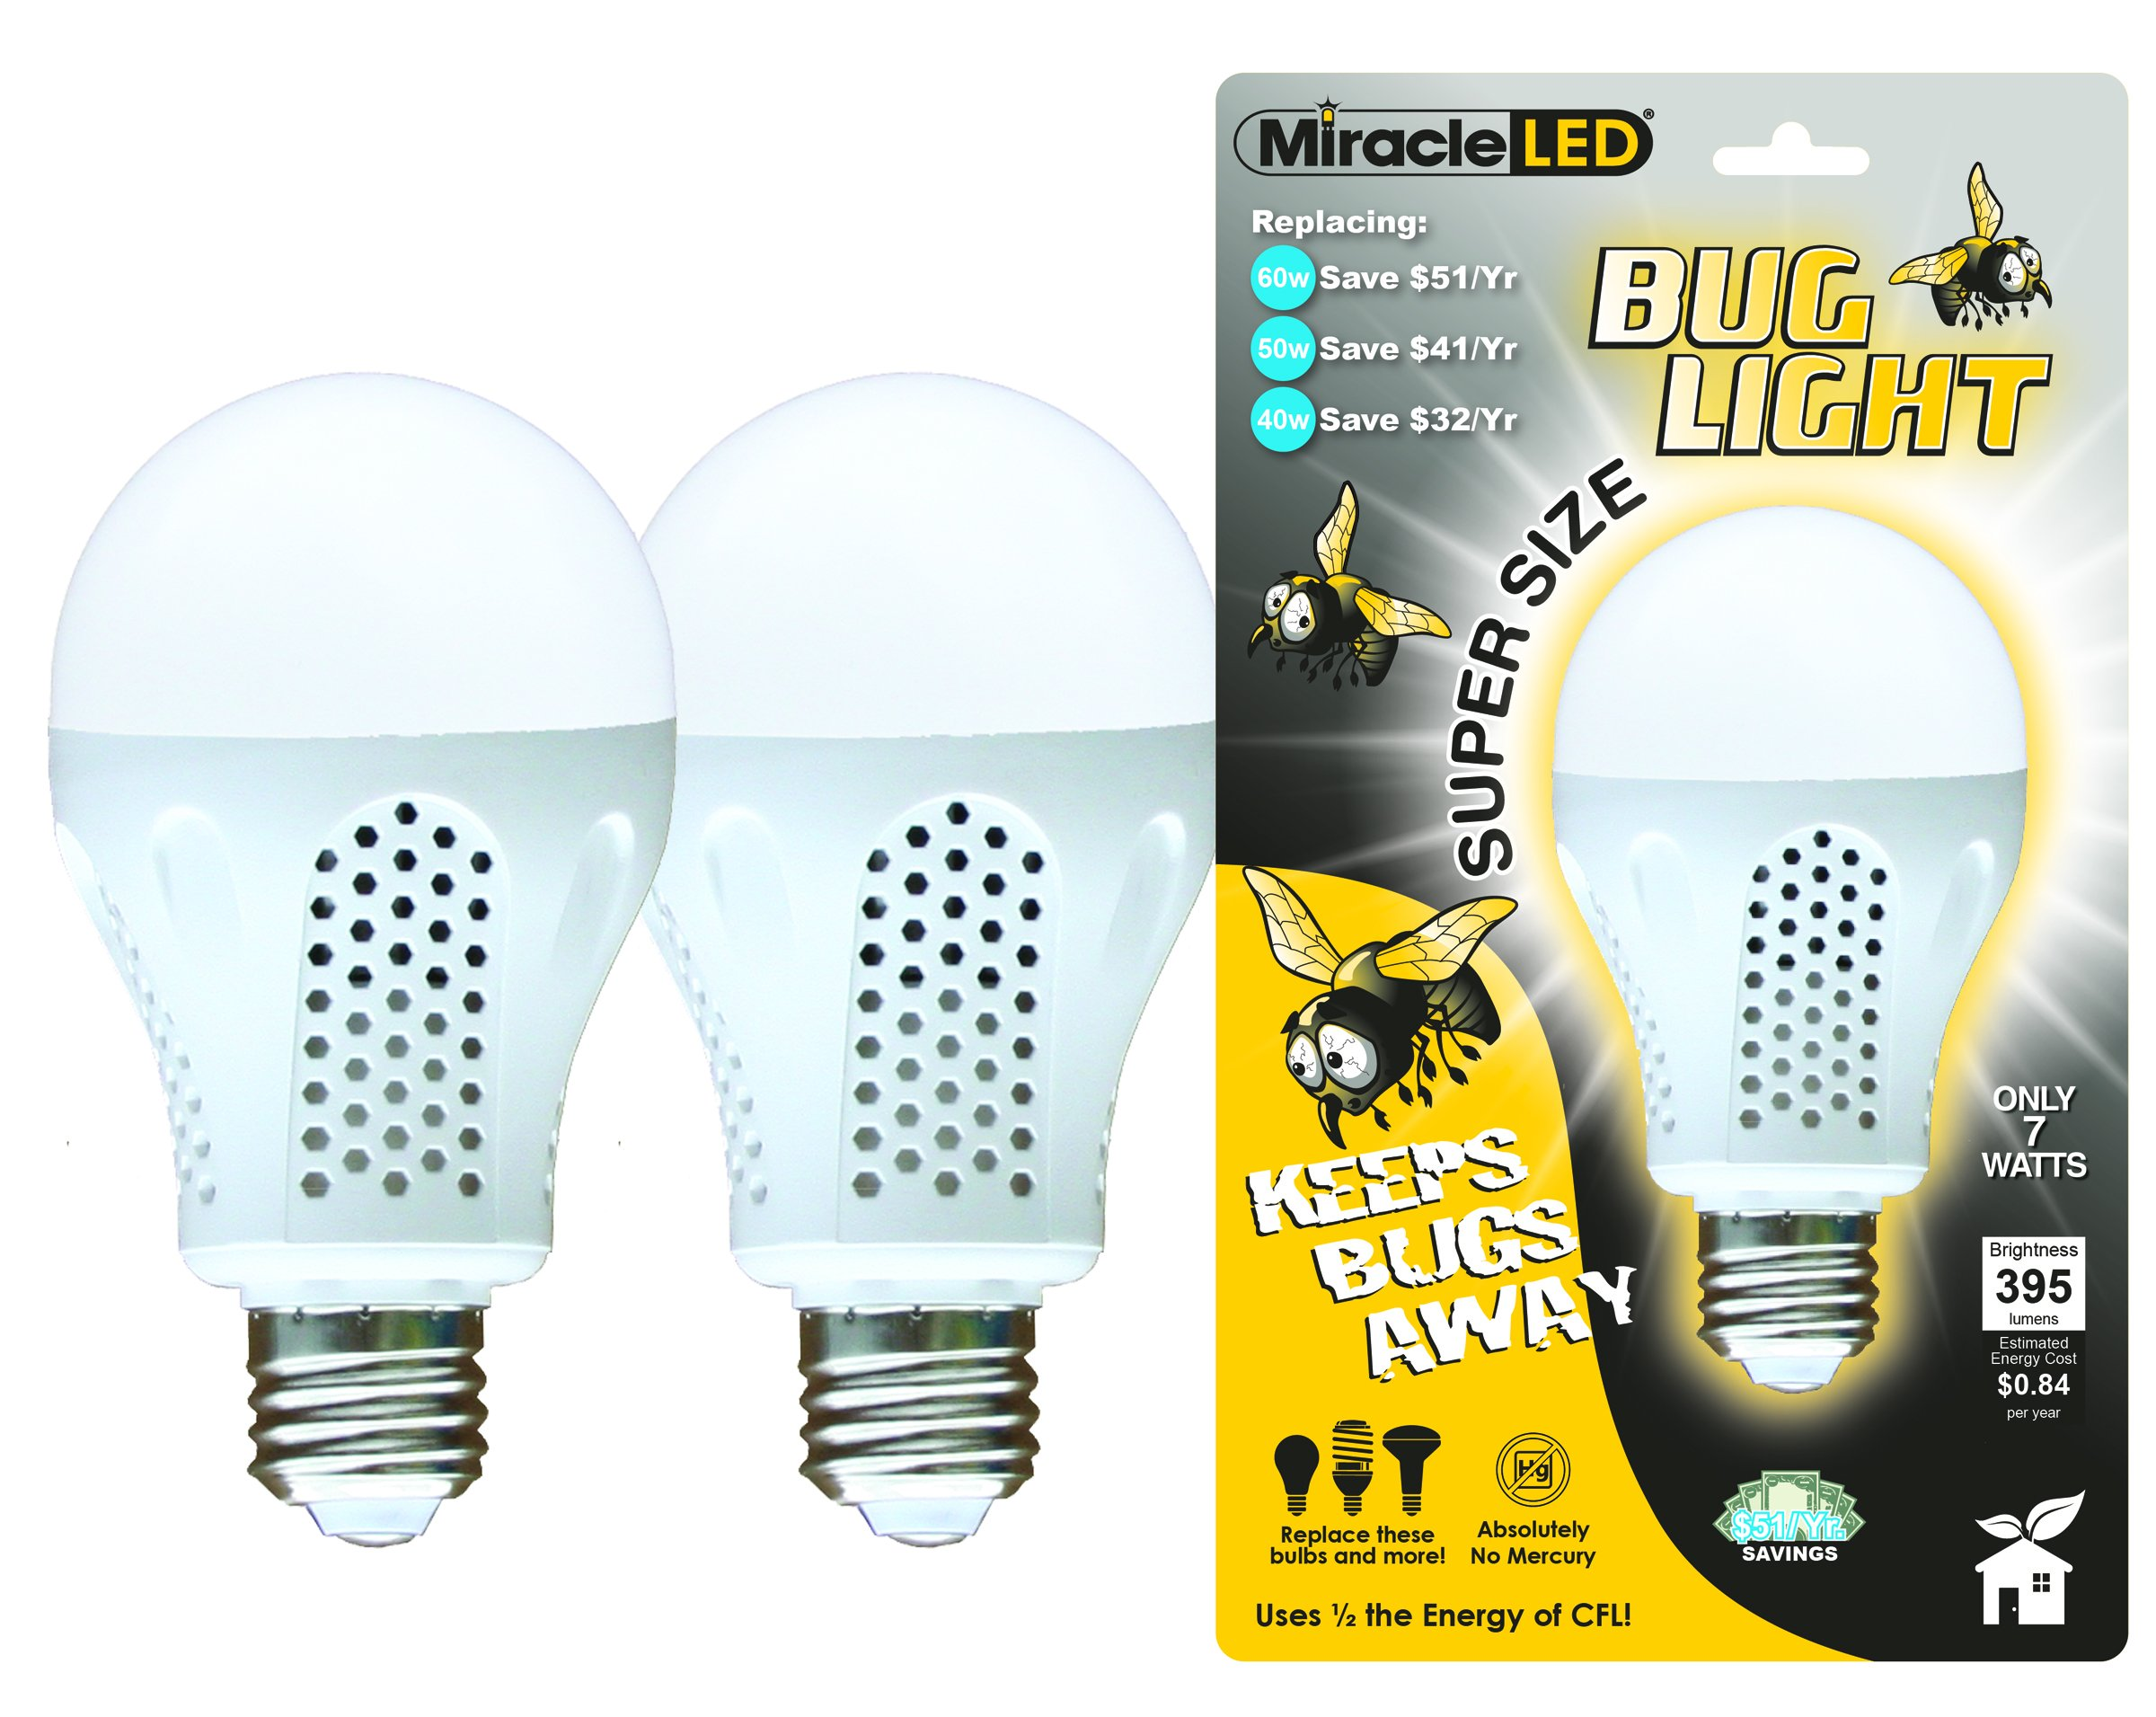 MiracleLED 604004 Super Bug Light, Yellow